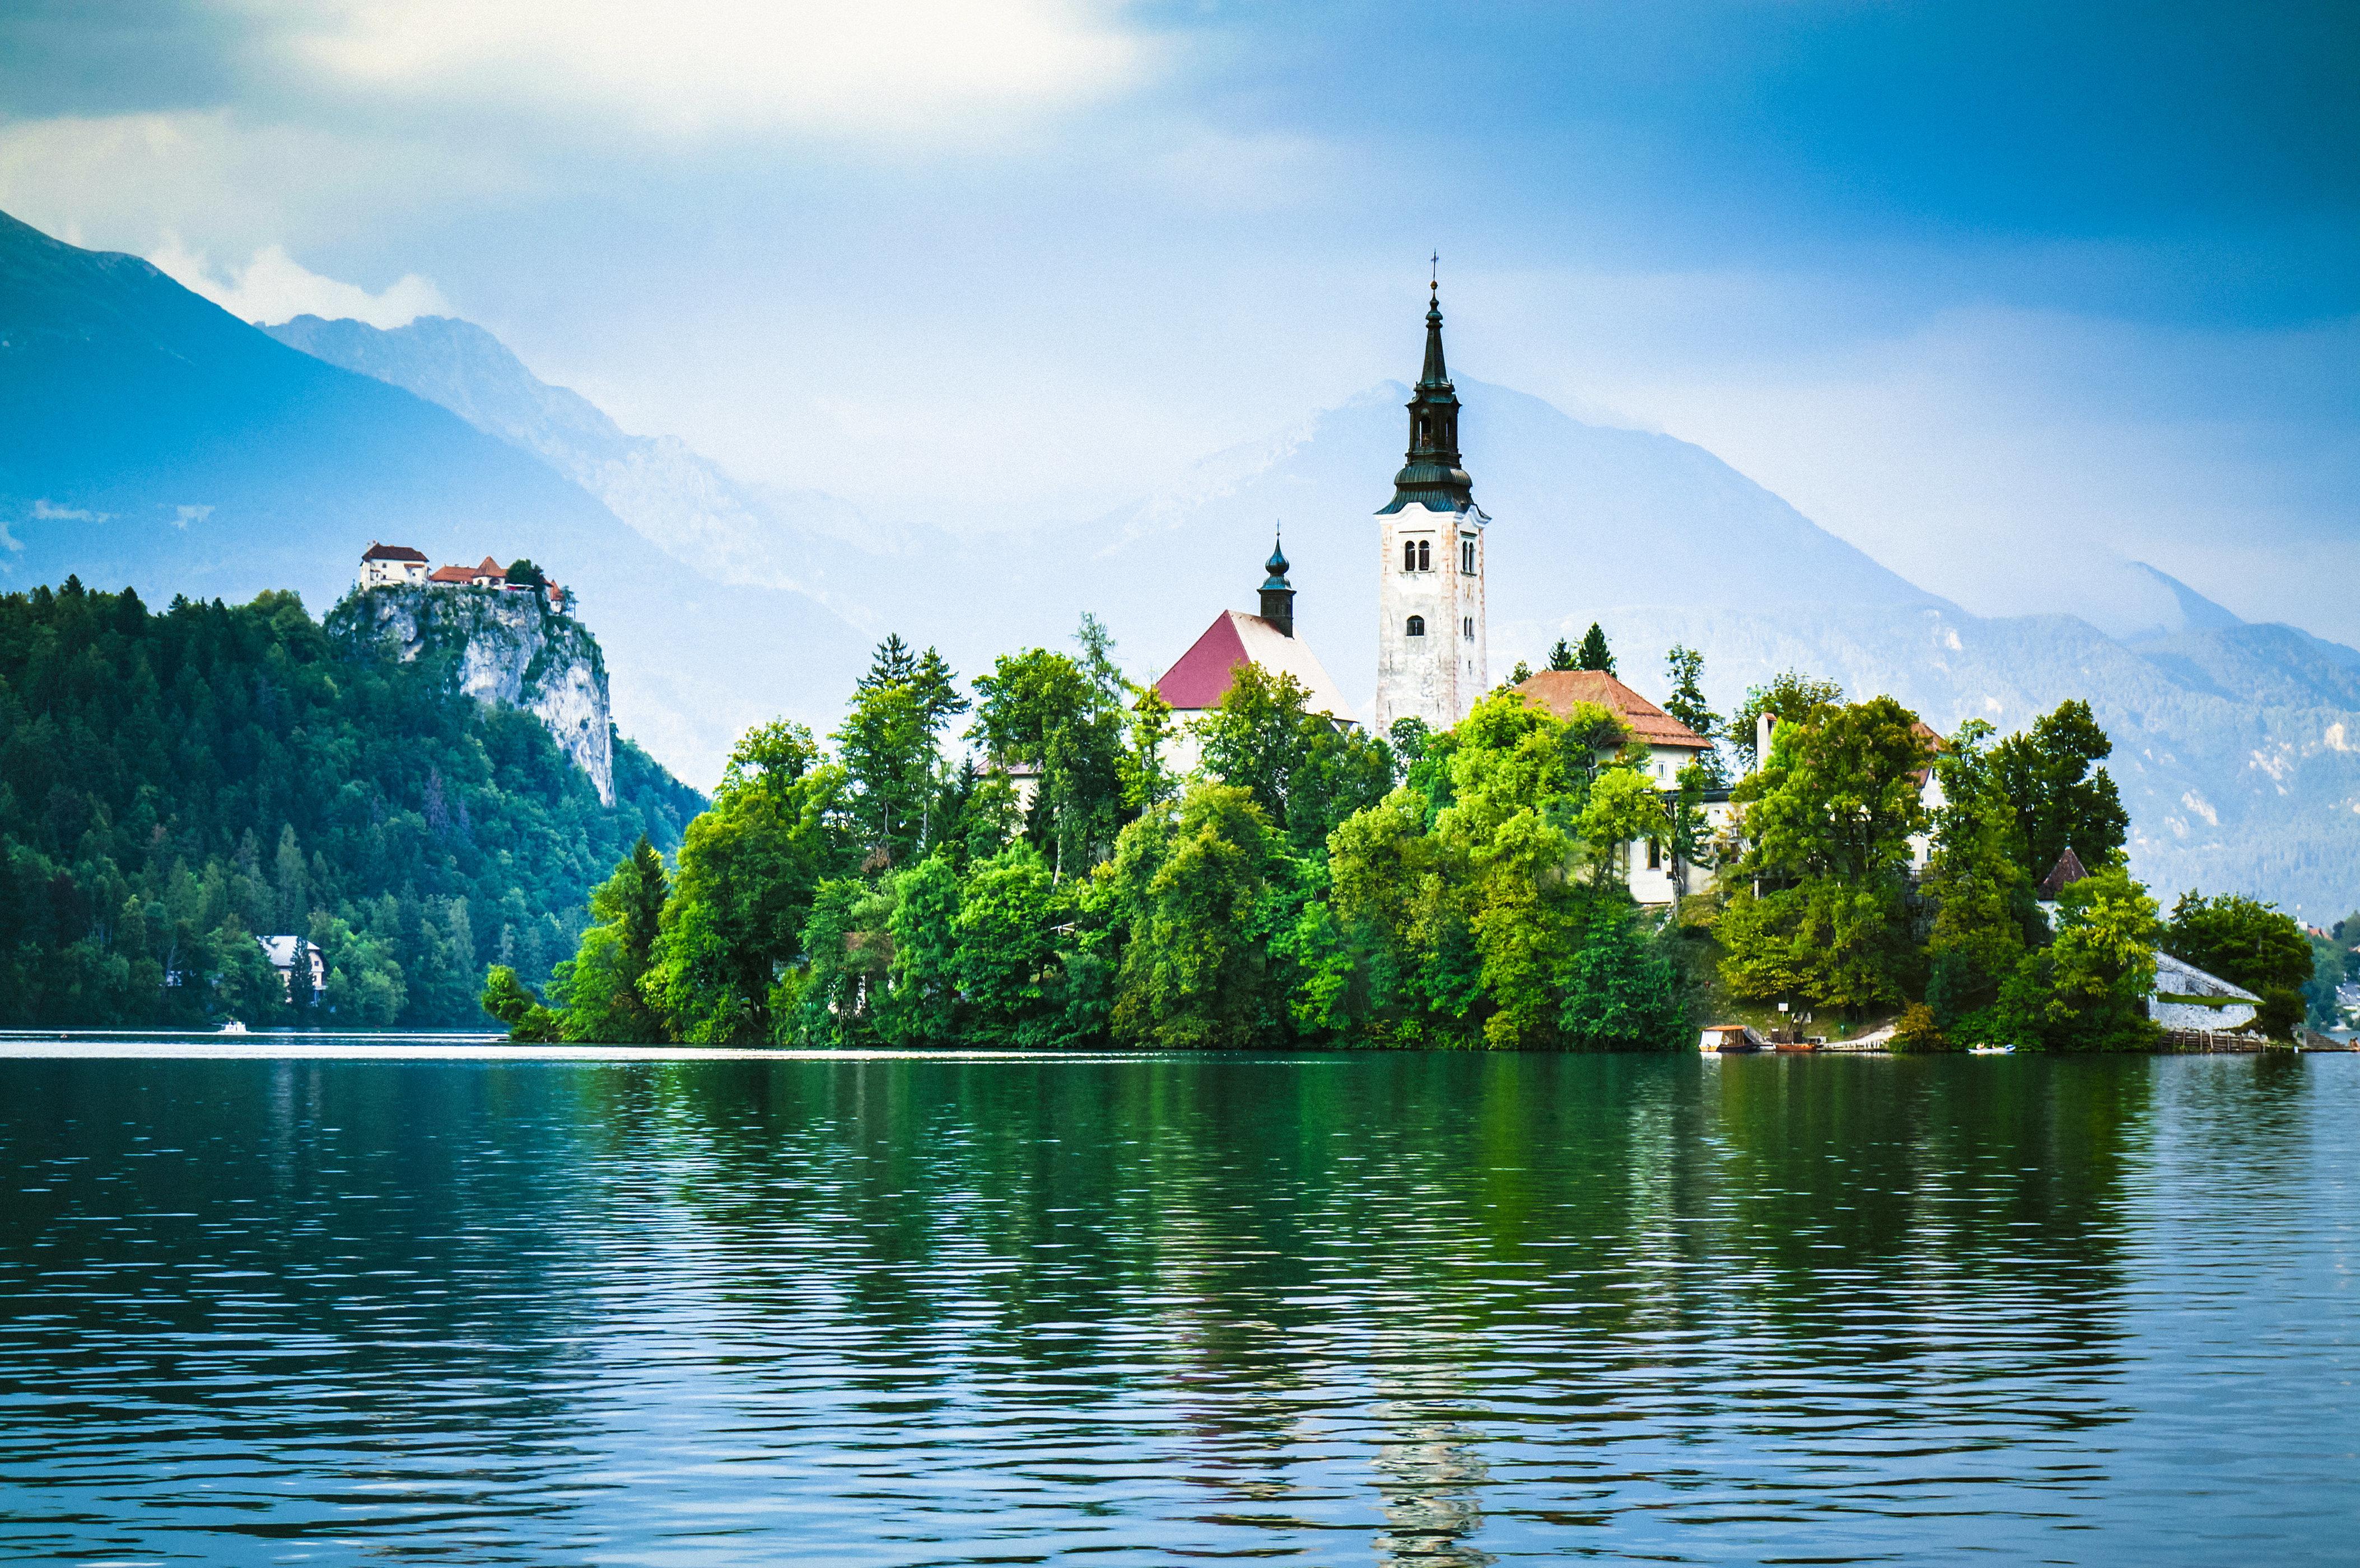 Santa Maria Church on the island on the Lake Bled (Blejsko jezero), lake in the Julian Alps in northwestern Slovenia is a very popular tourist destination.